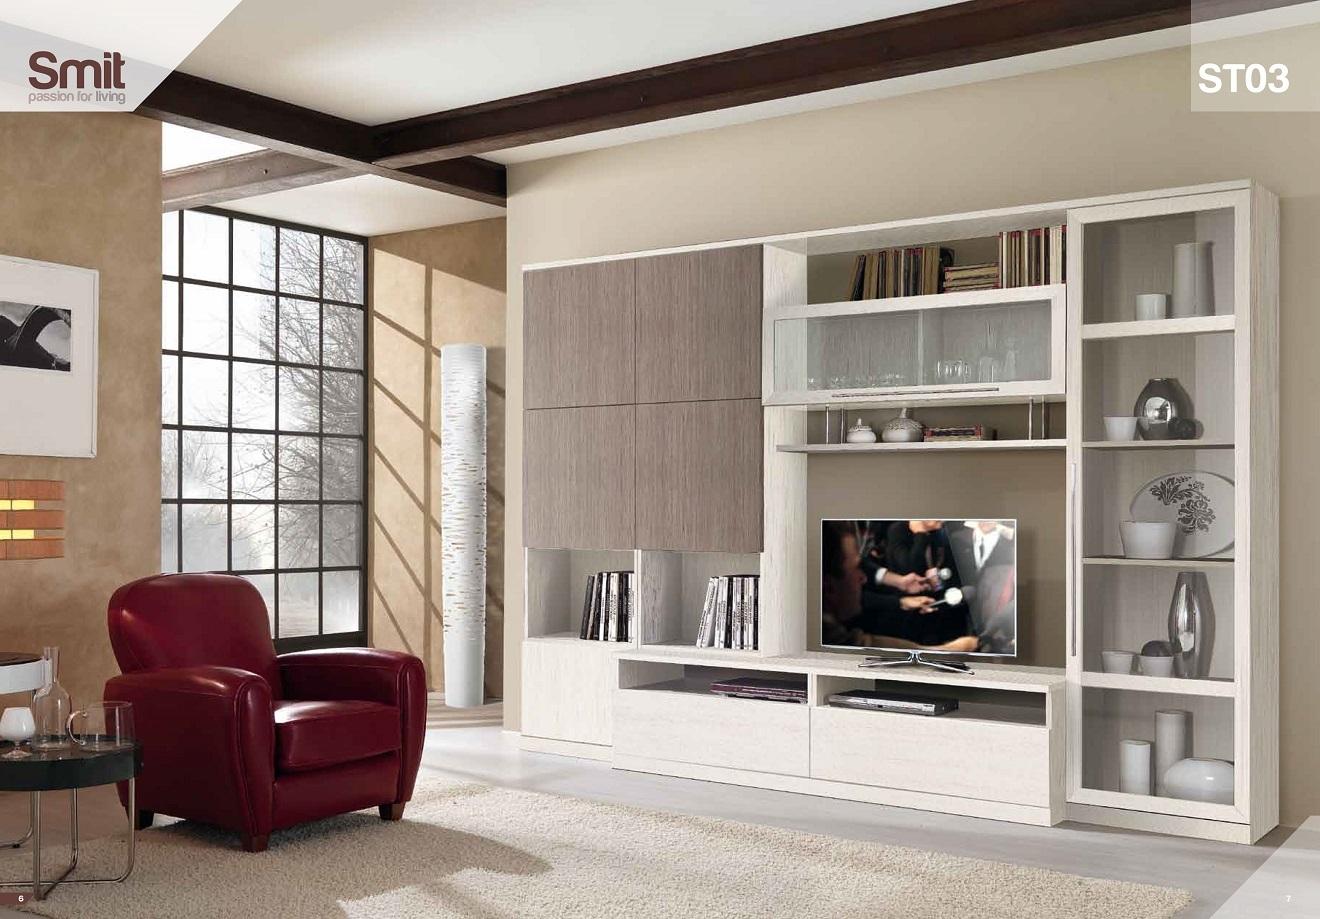 Decoraci n de interiores decoraci n de interiores de - Paredes decoradas modernas ...